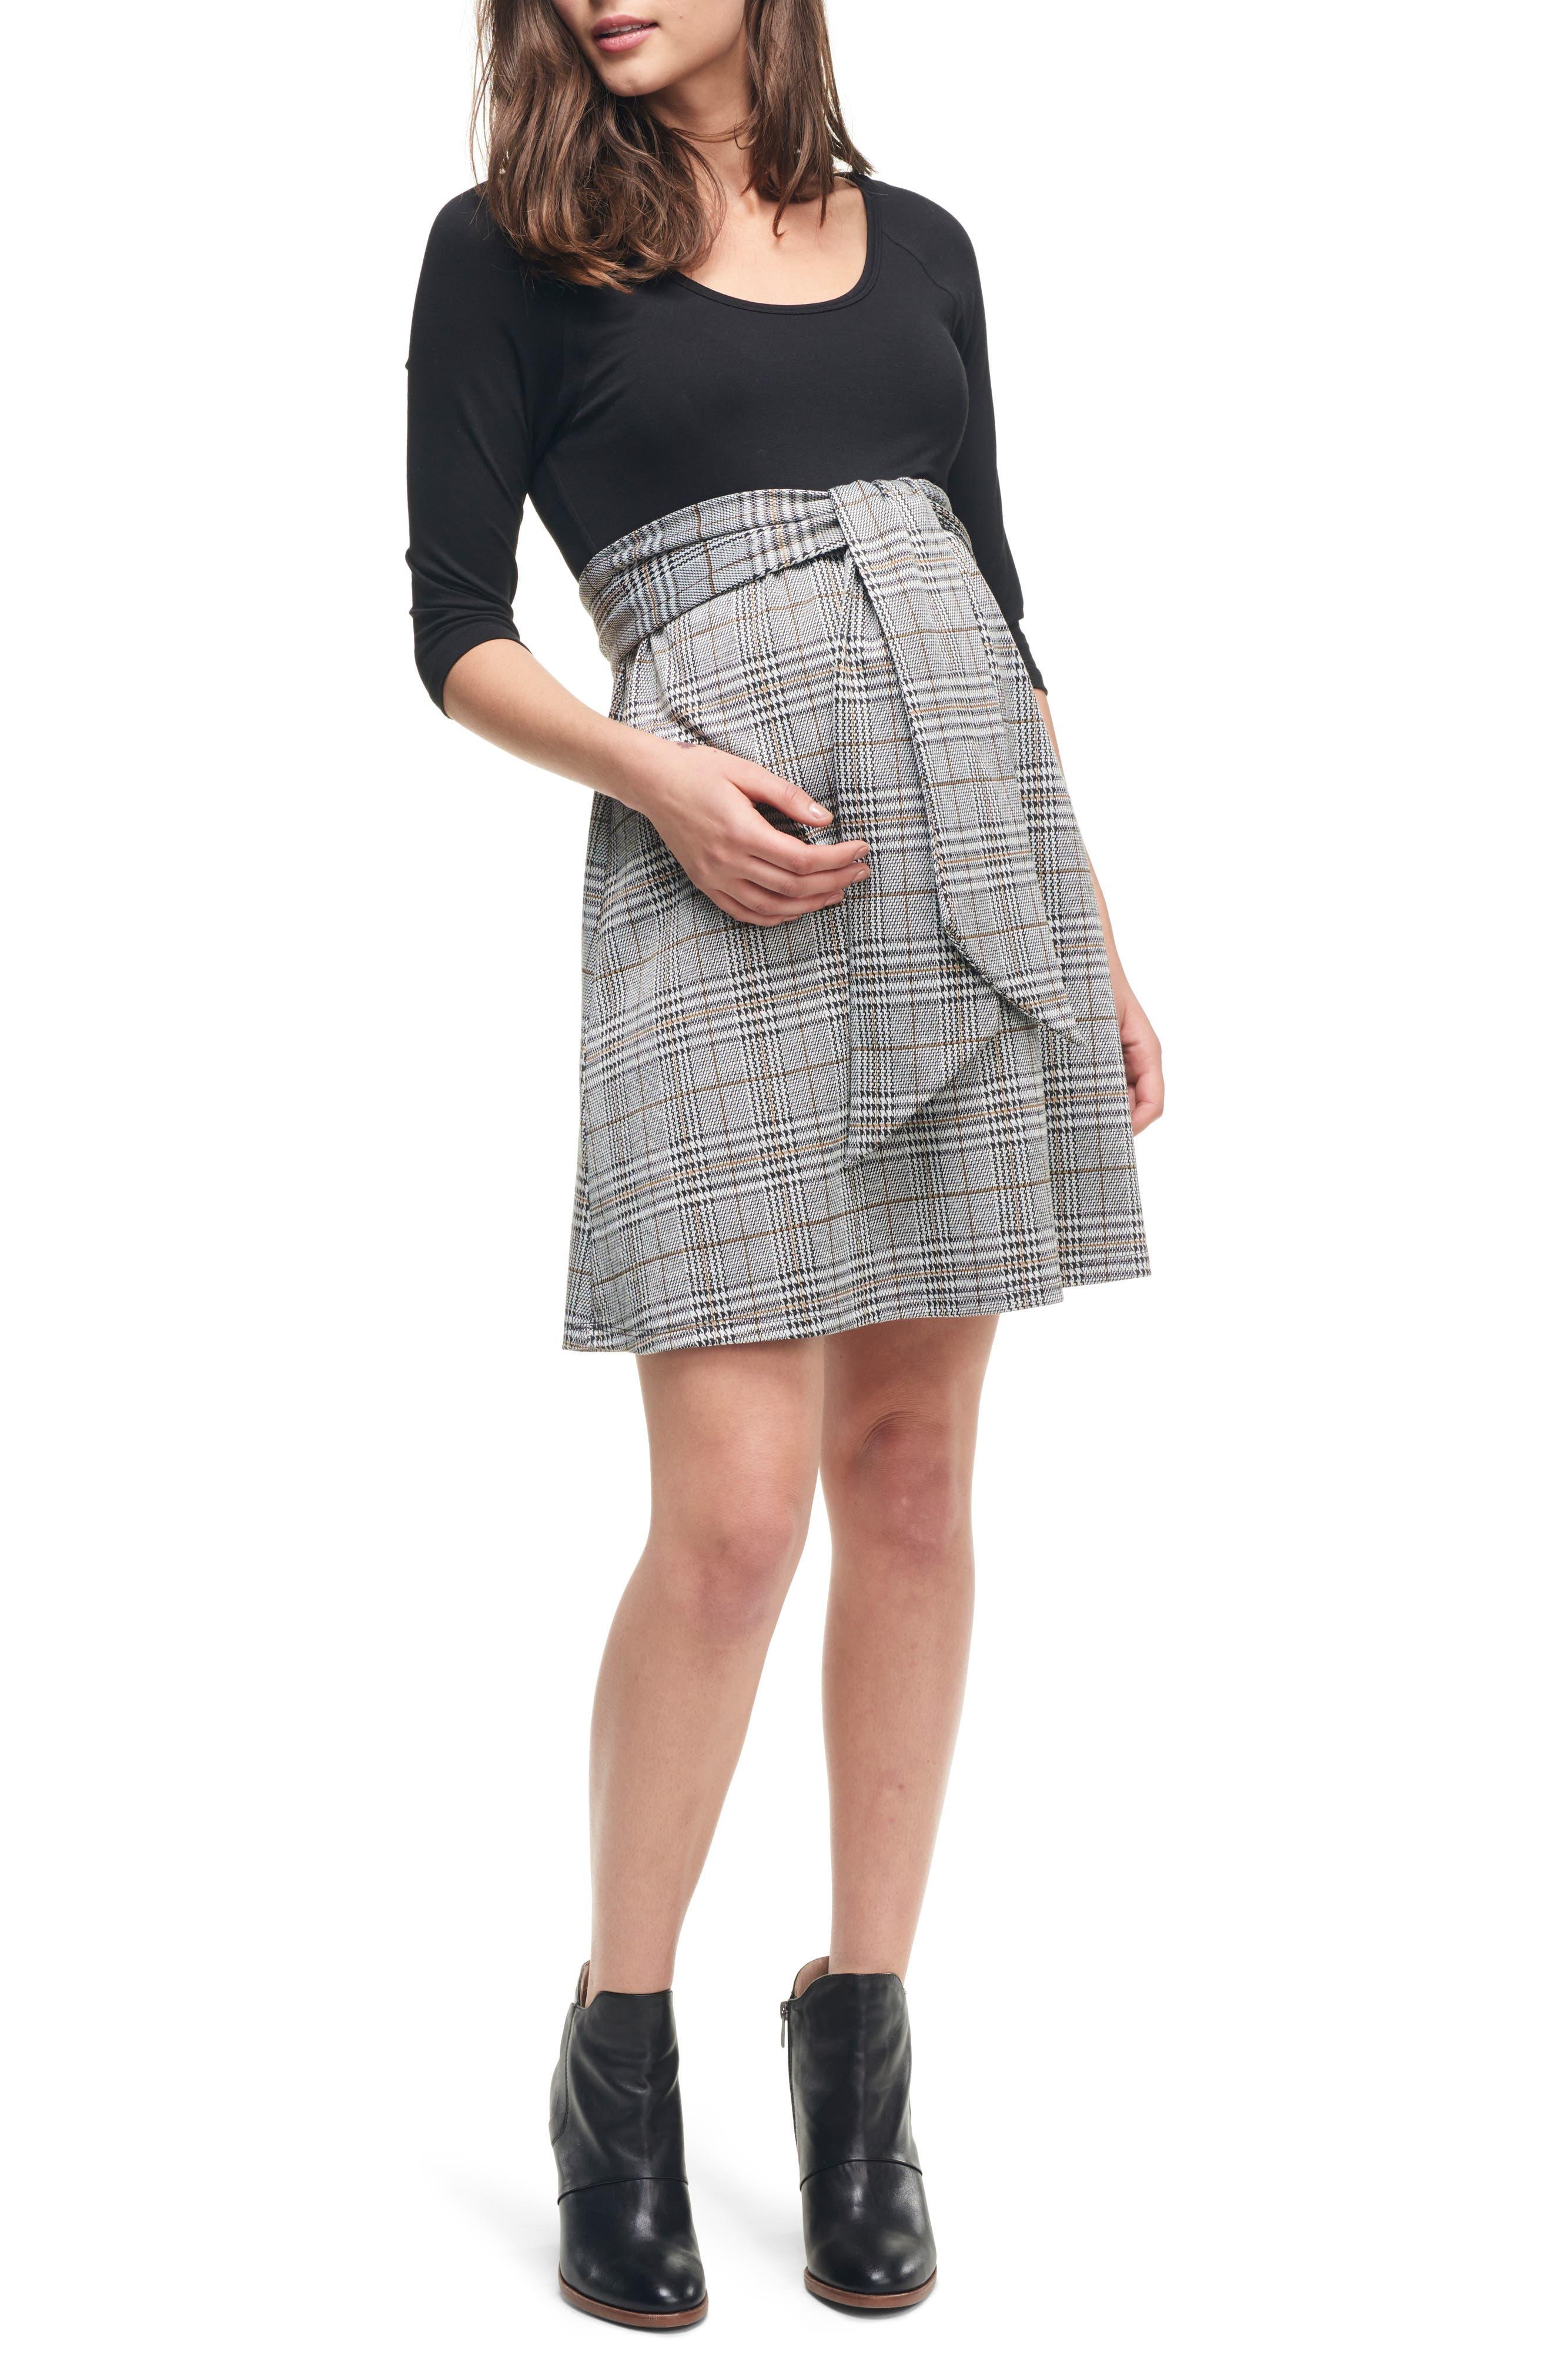 MATERNAL AMERICA, Scoop Neck Maternity Dress, Main thumbnail 1, color, BLACK/ PLAID